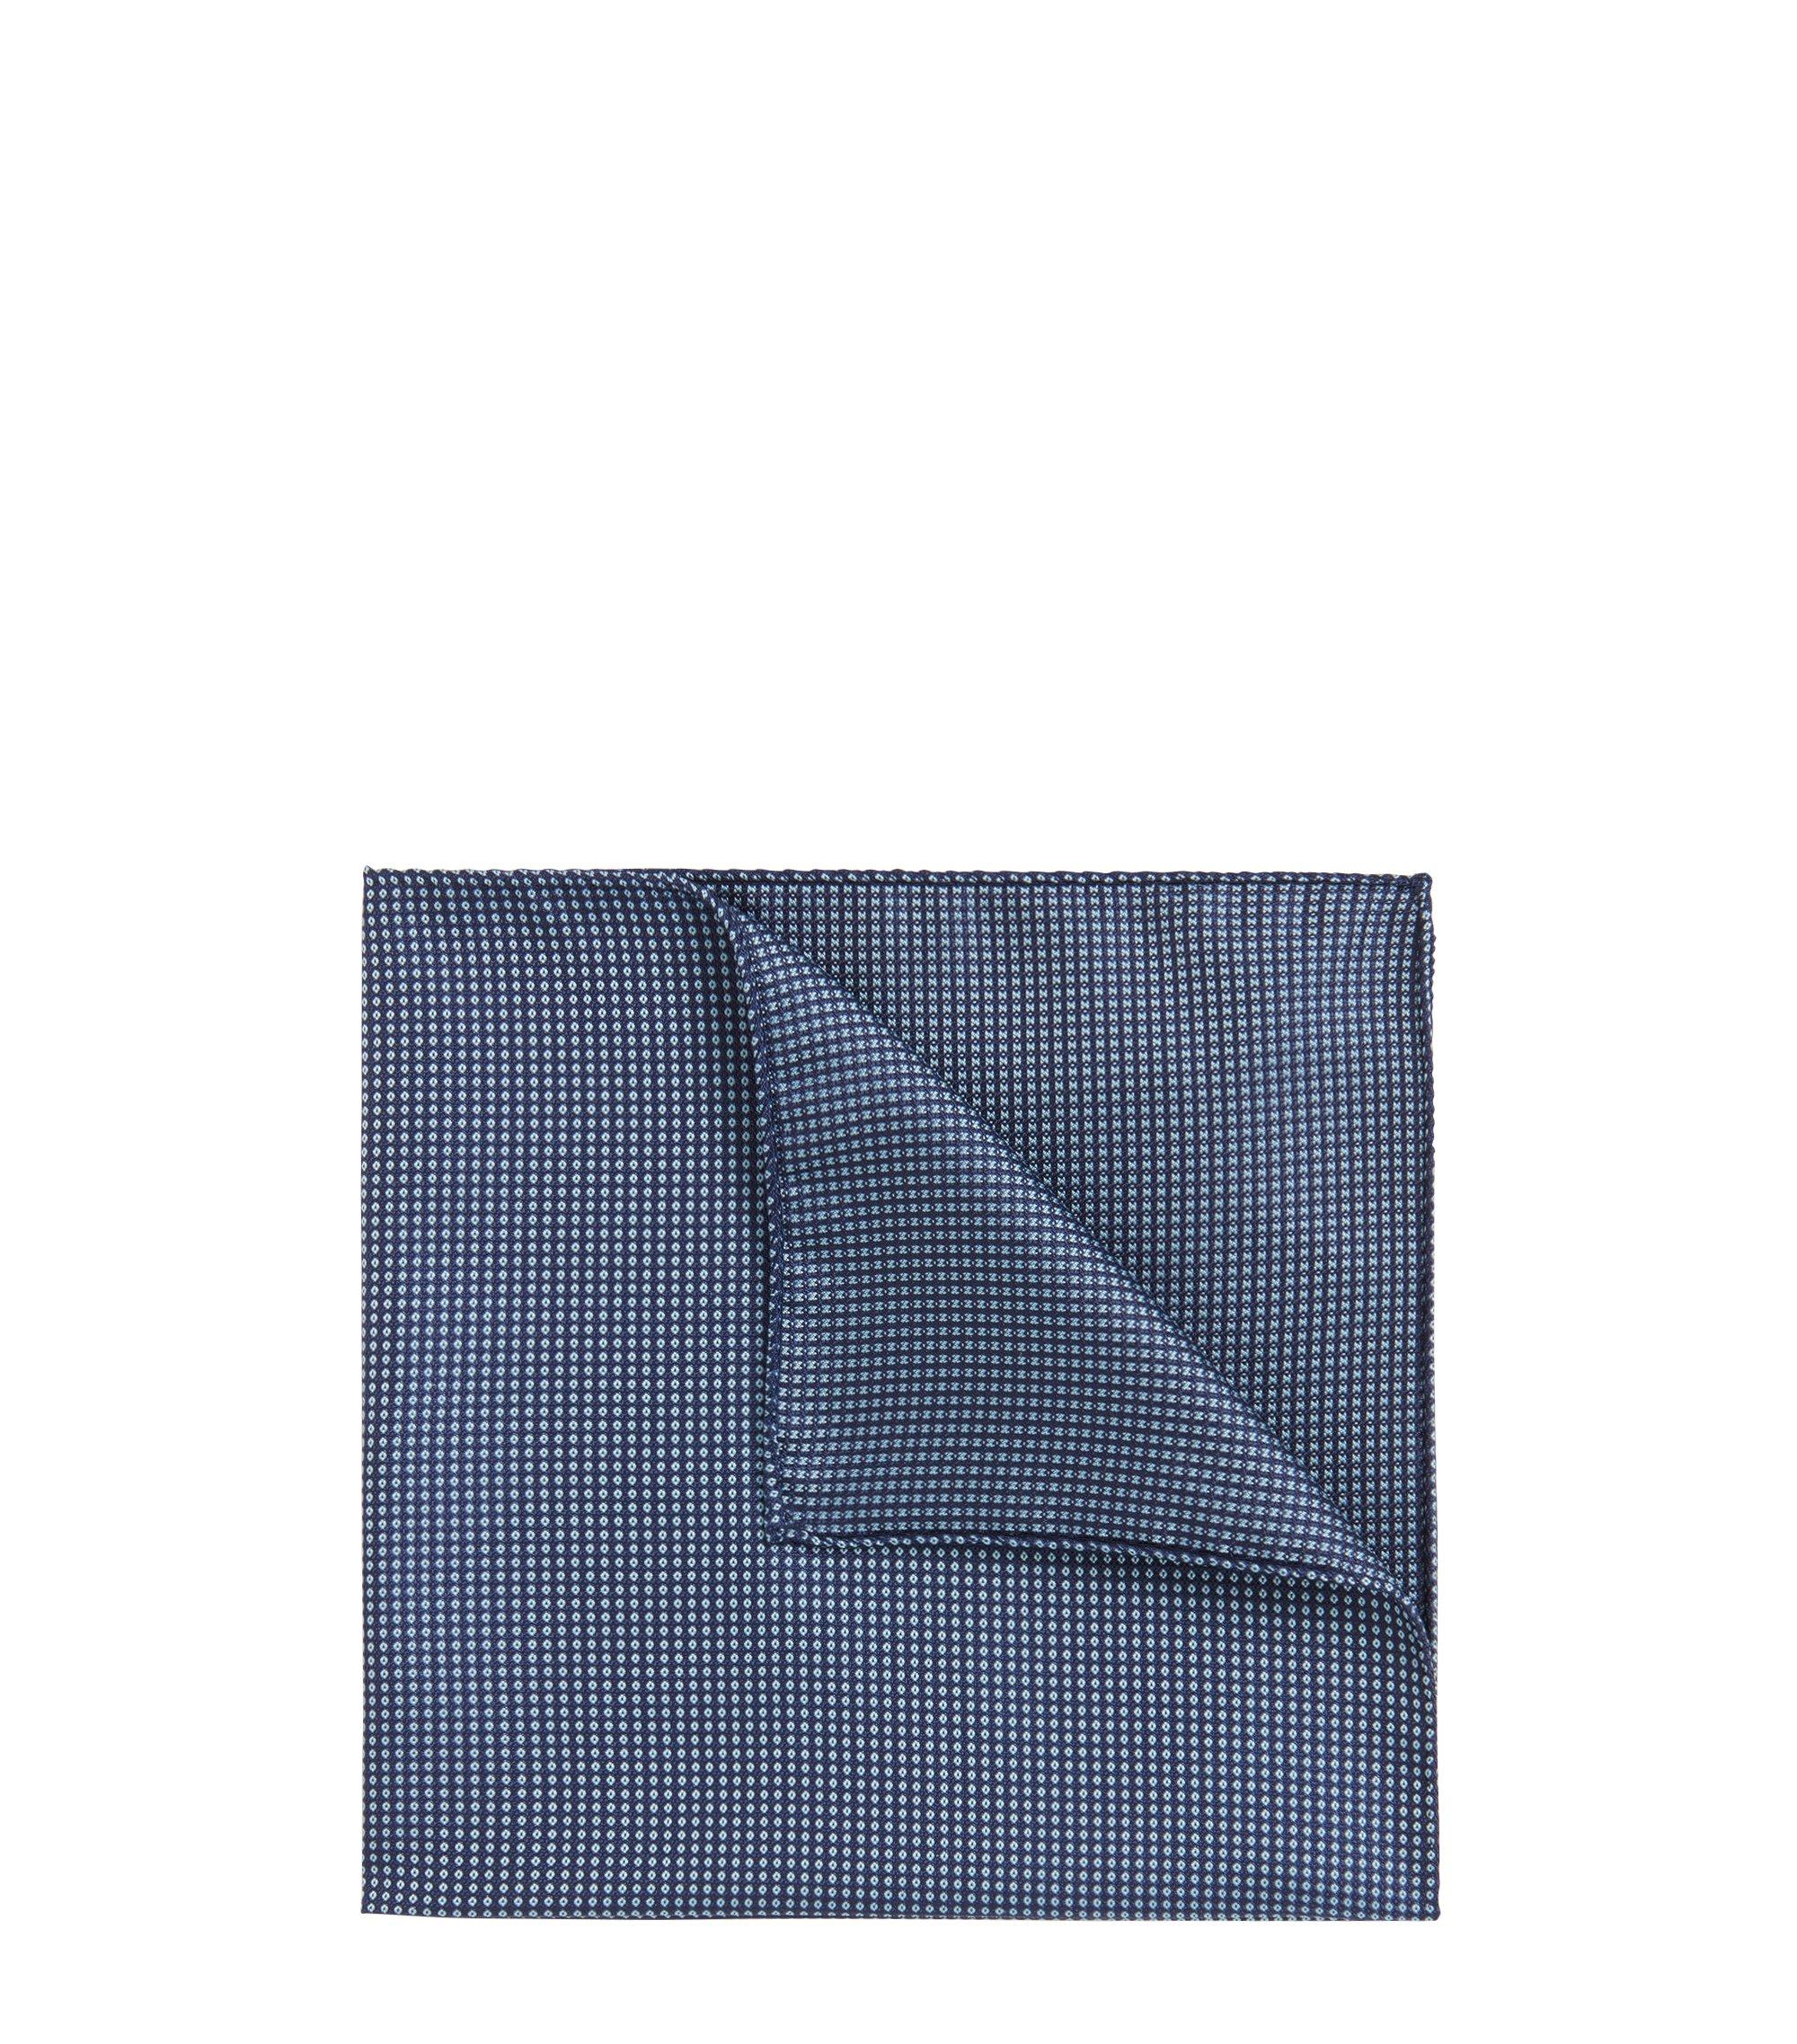 Pochette da taschino a disegni in seta jacquard, Blu scuro